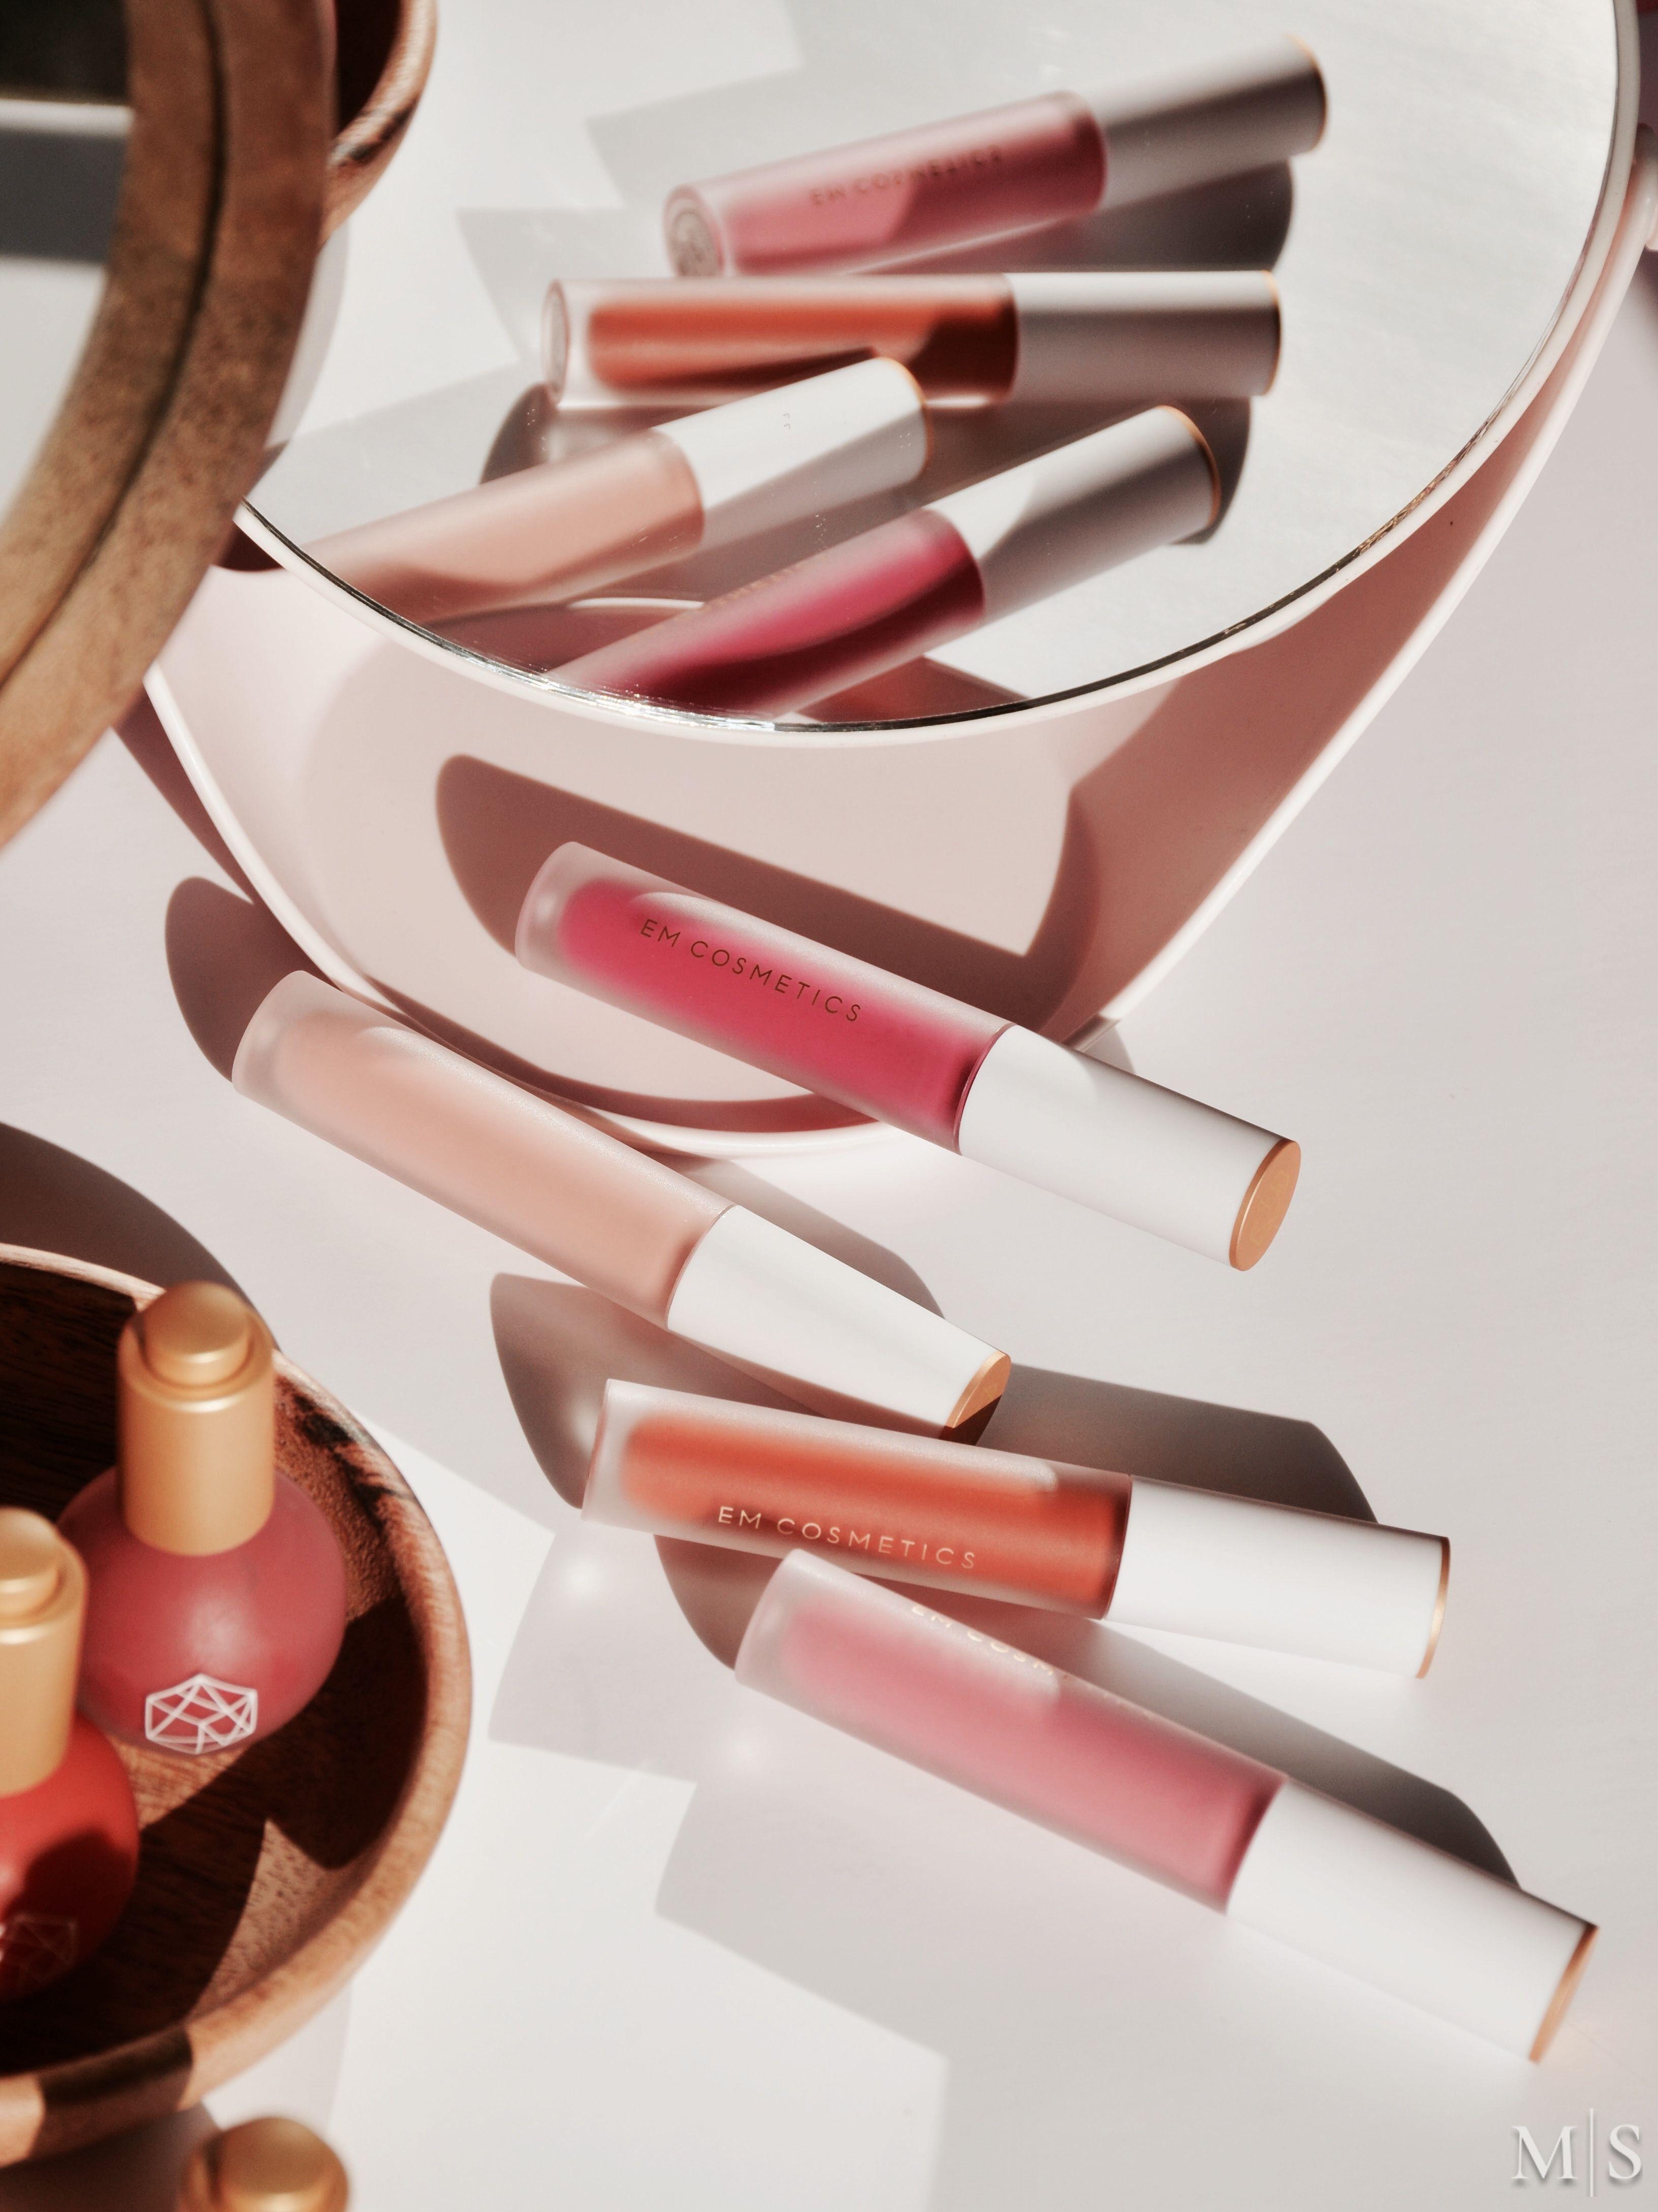 EM Cosmetics Color Drops Serum Blush + New True Gloss